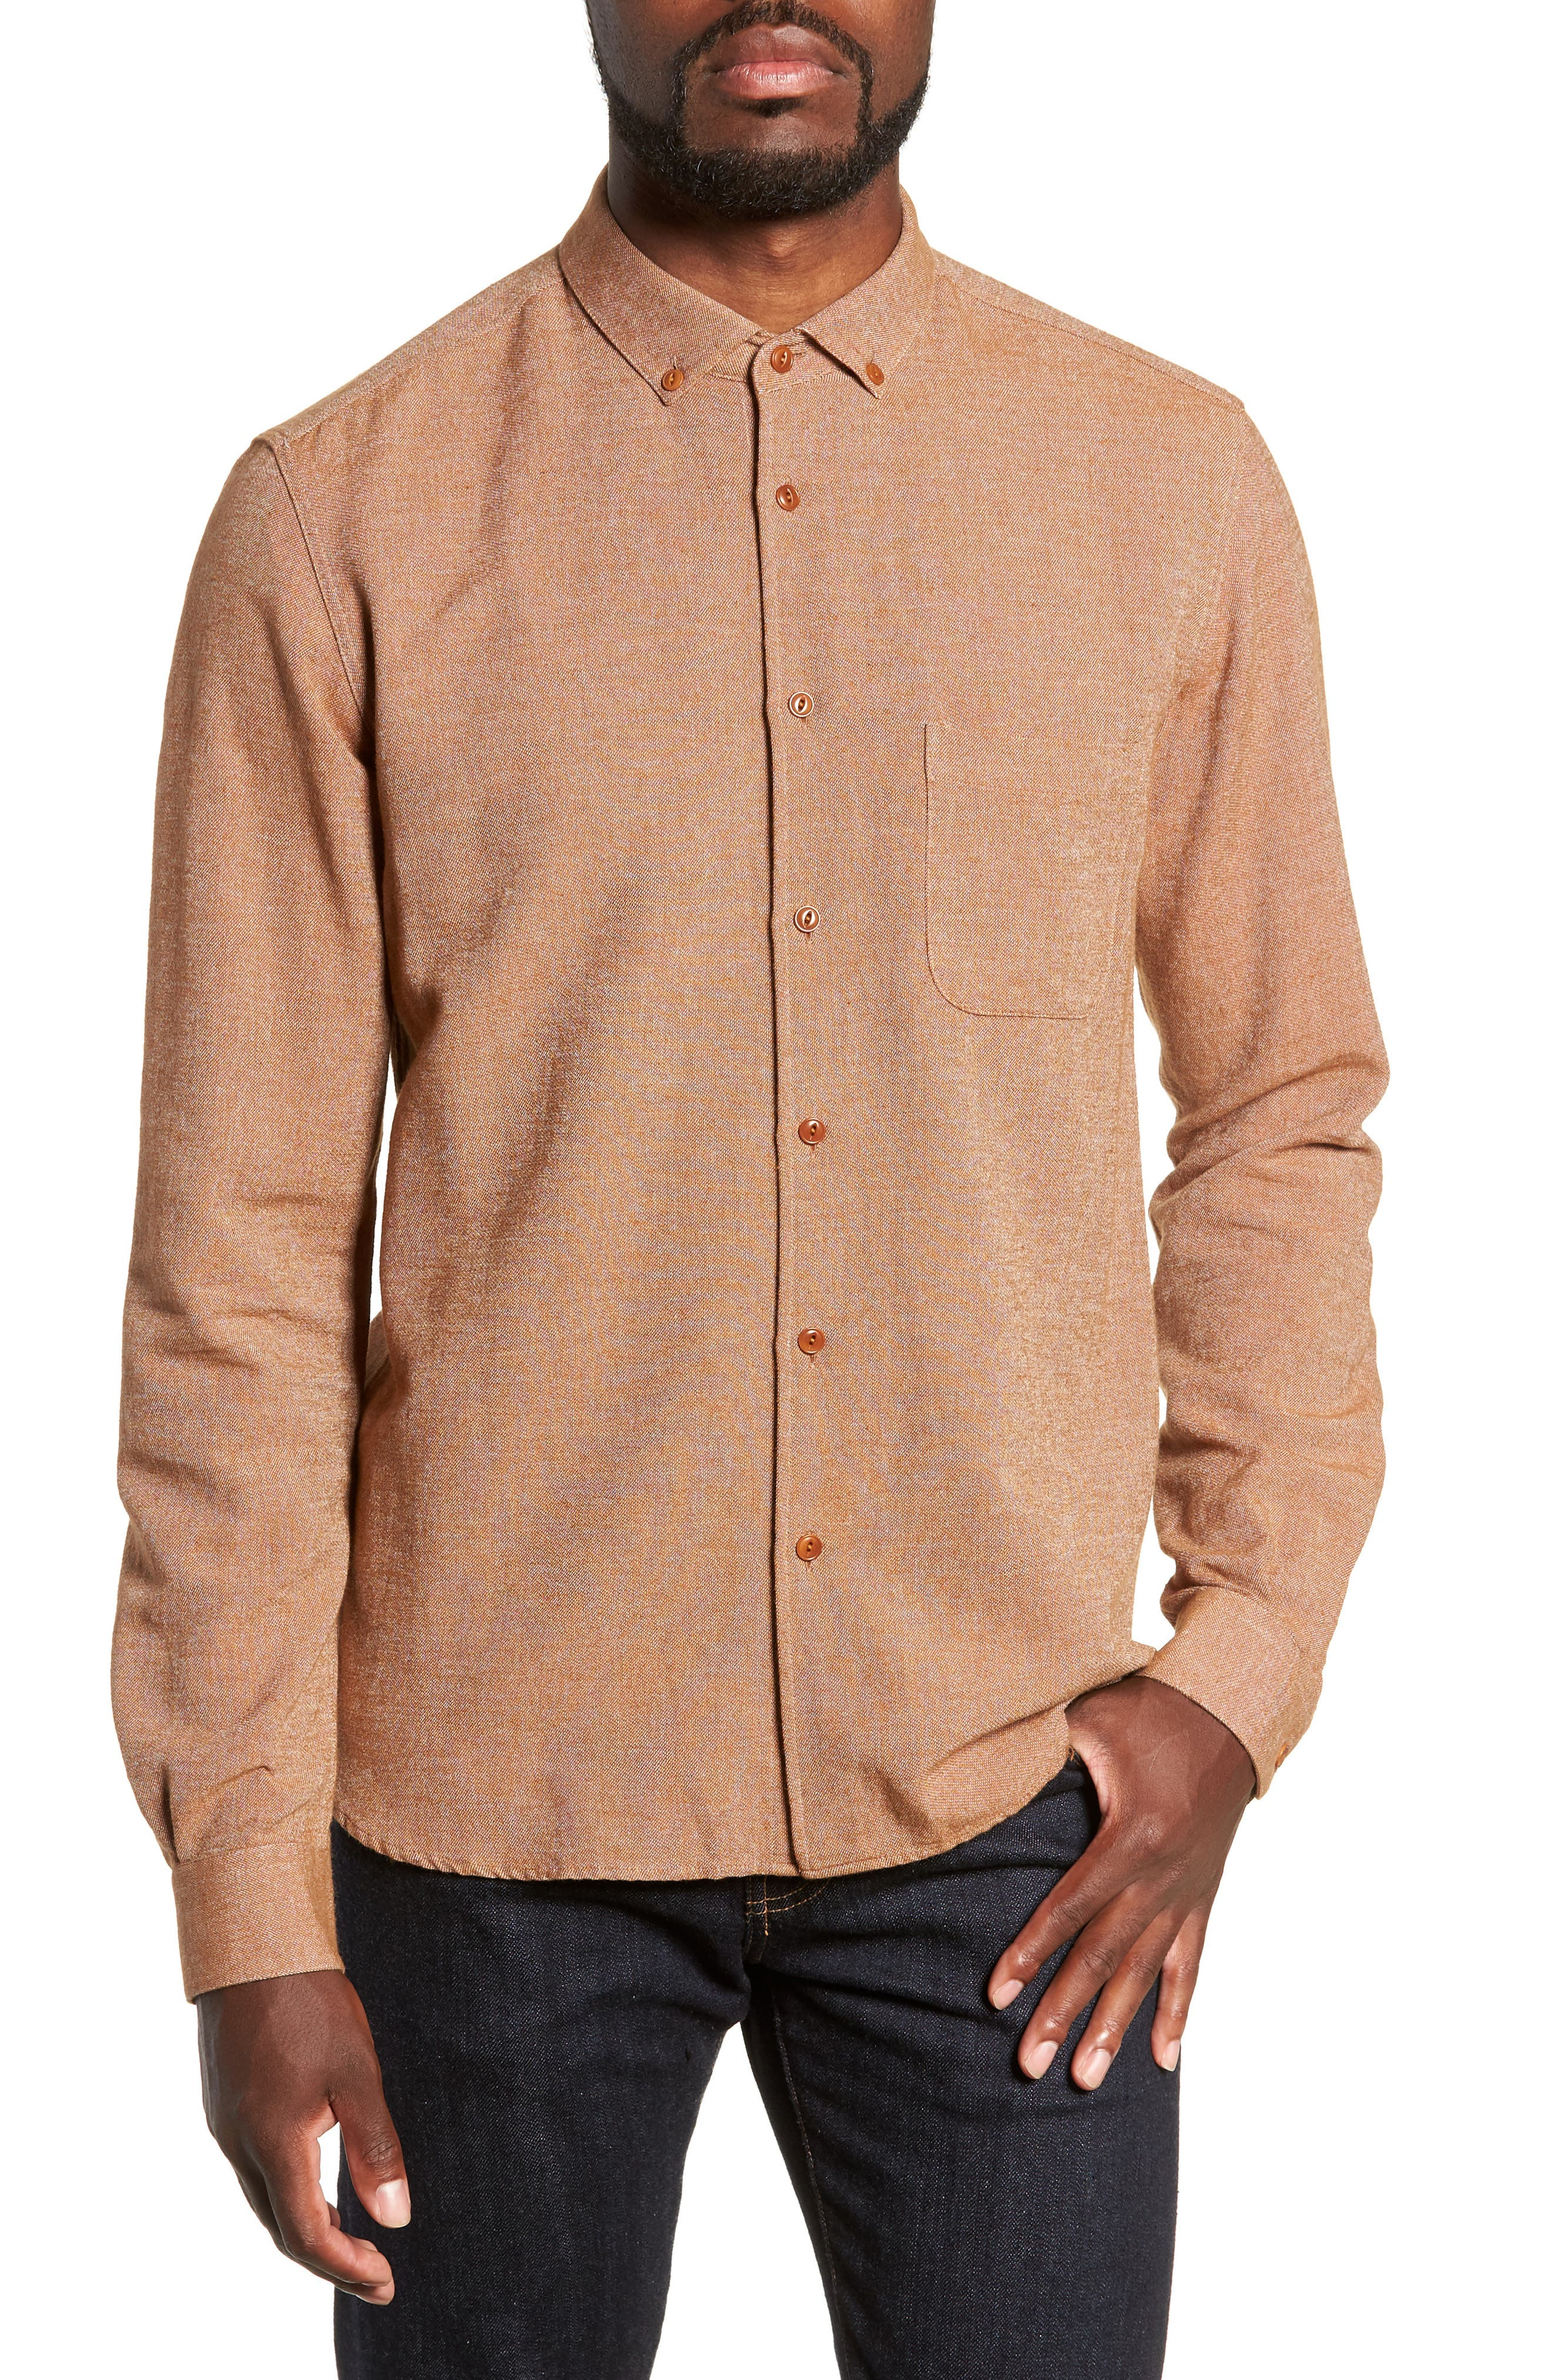 Dean Regular Fit Chambray Shirt,                         Main,                         color, 200